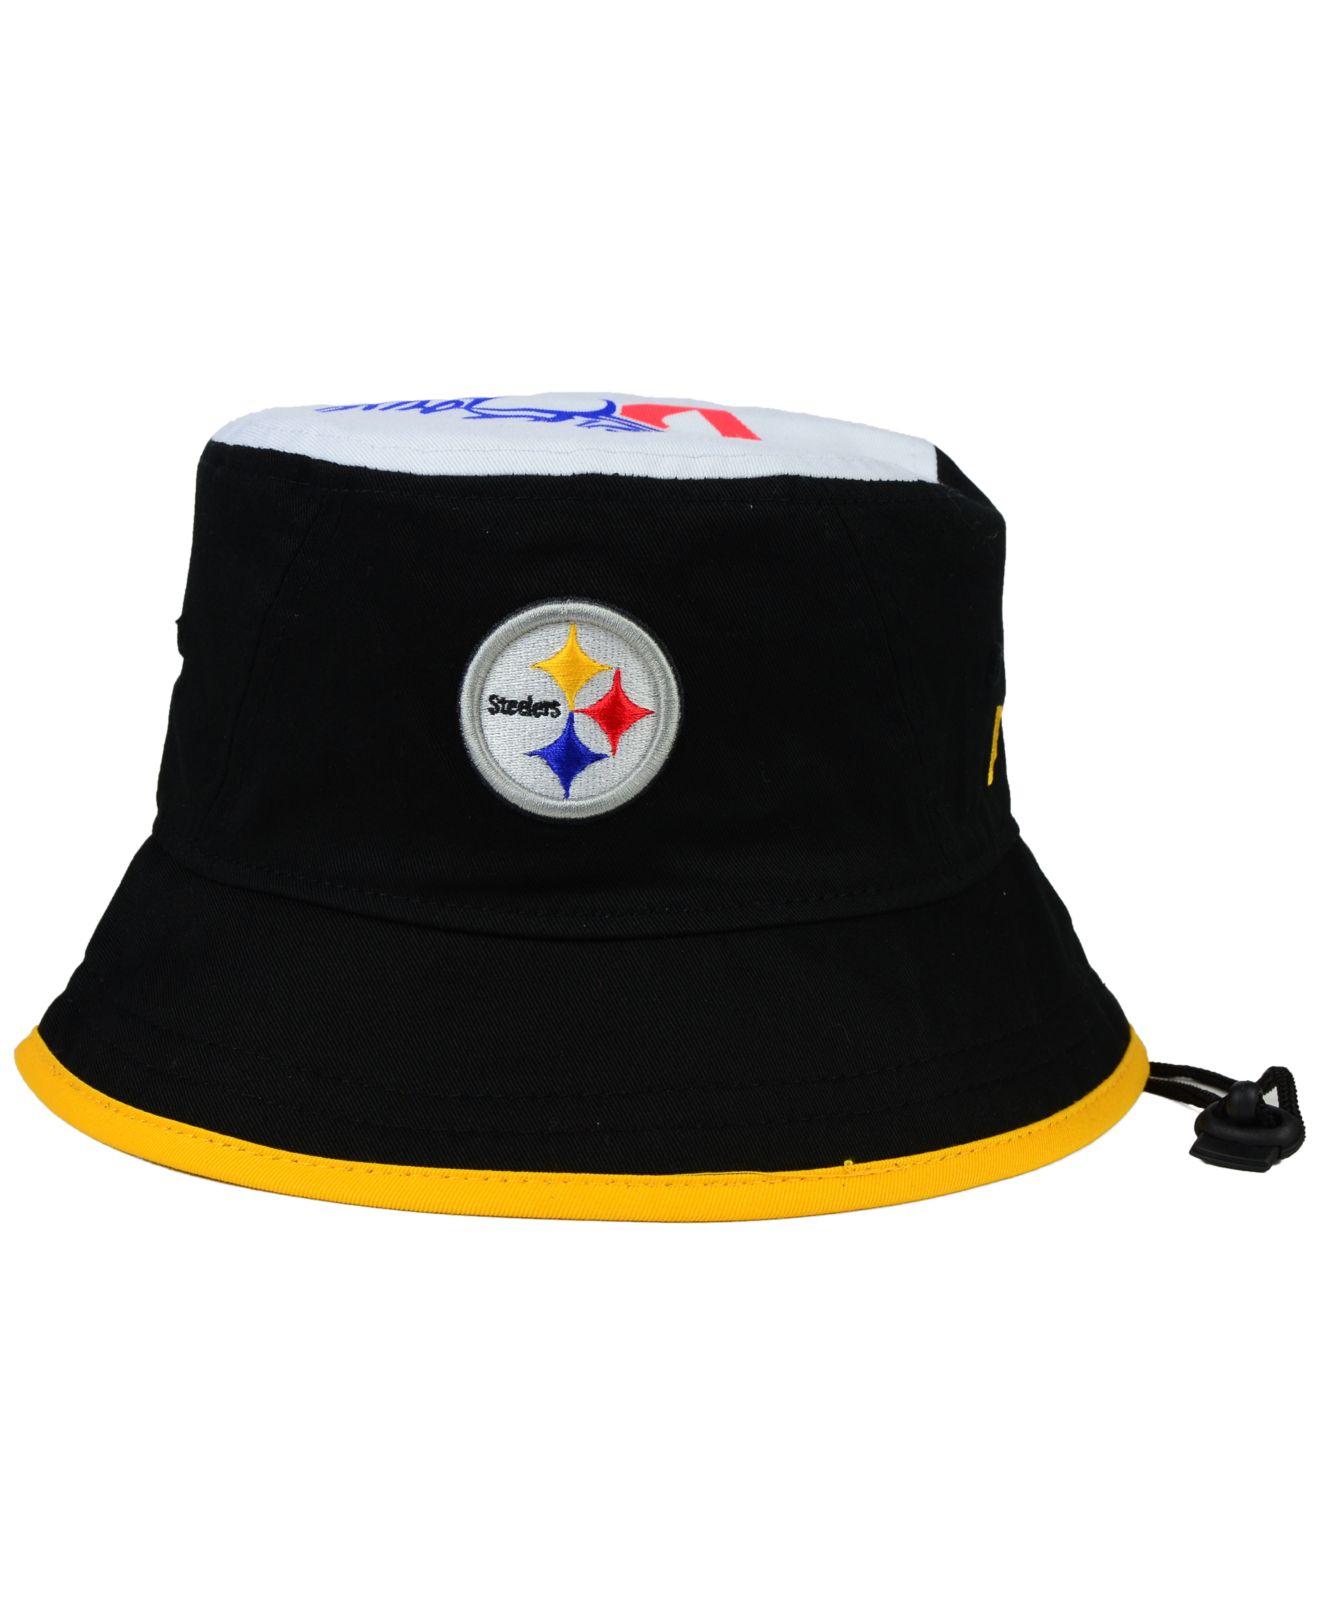 e7b024c3202 ... ebay lyst ktz pittsburgh steelers traveler bucket hat in black for men  d2c1a 6bcc1